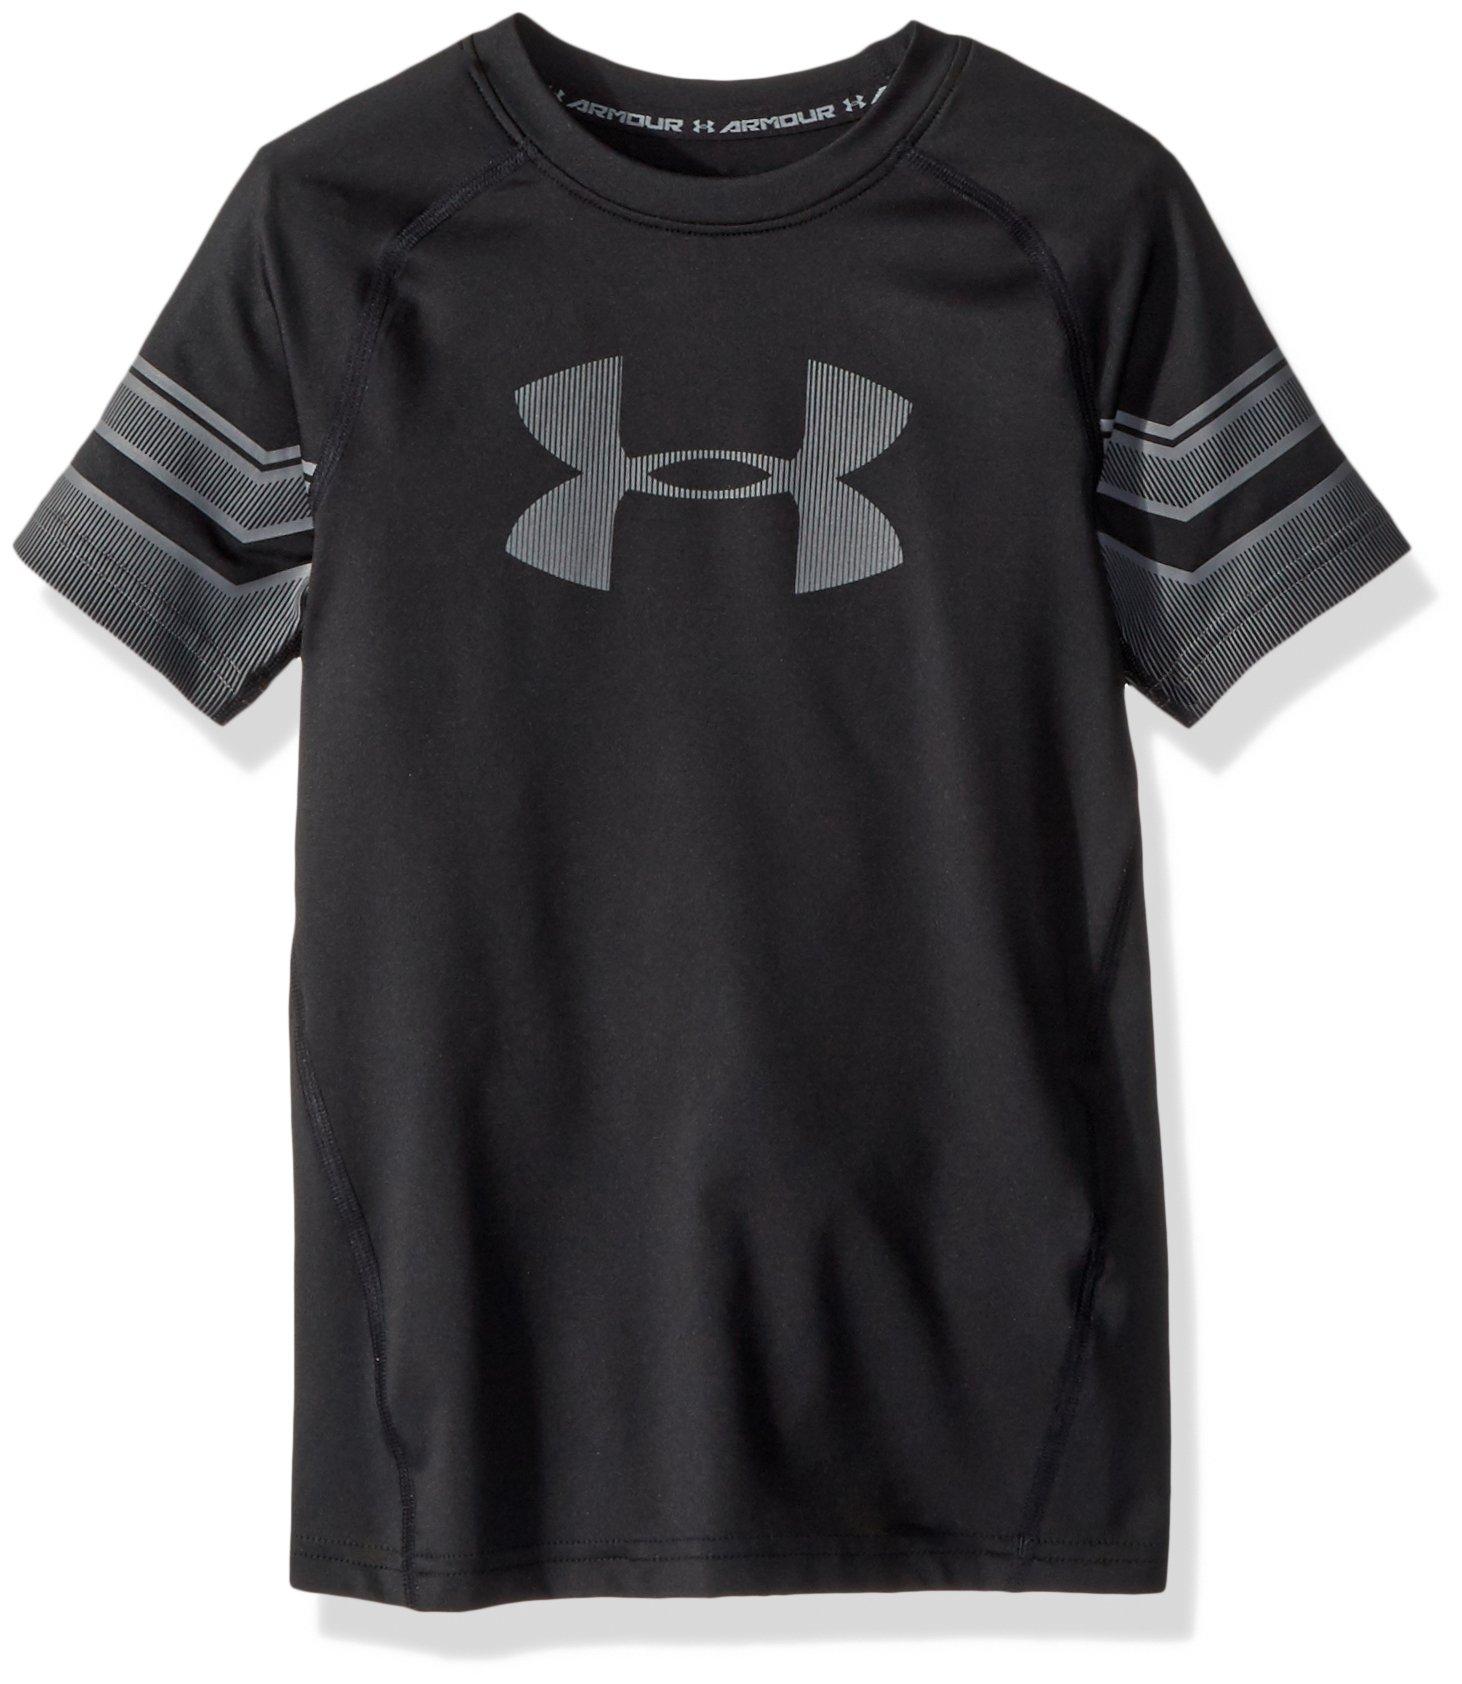 Under Armour Boys Graphic Short sleeve, Black/Graphite, Youth Medium